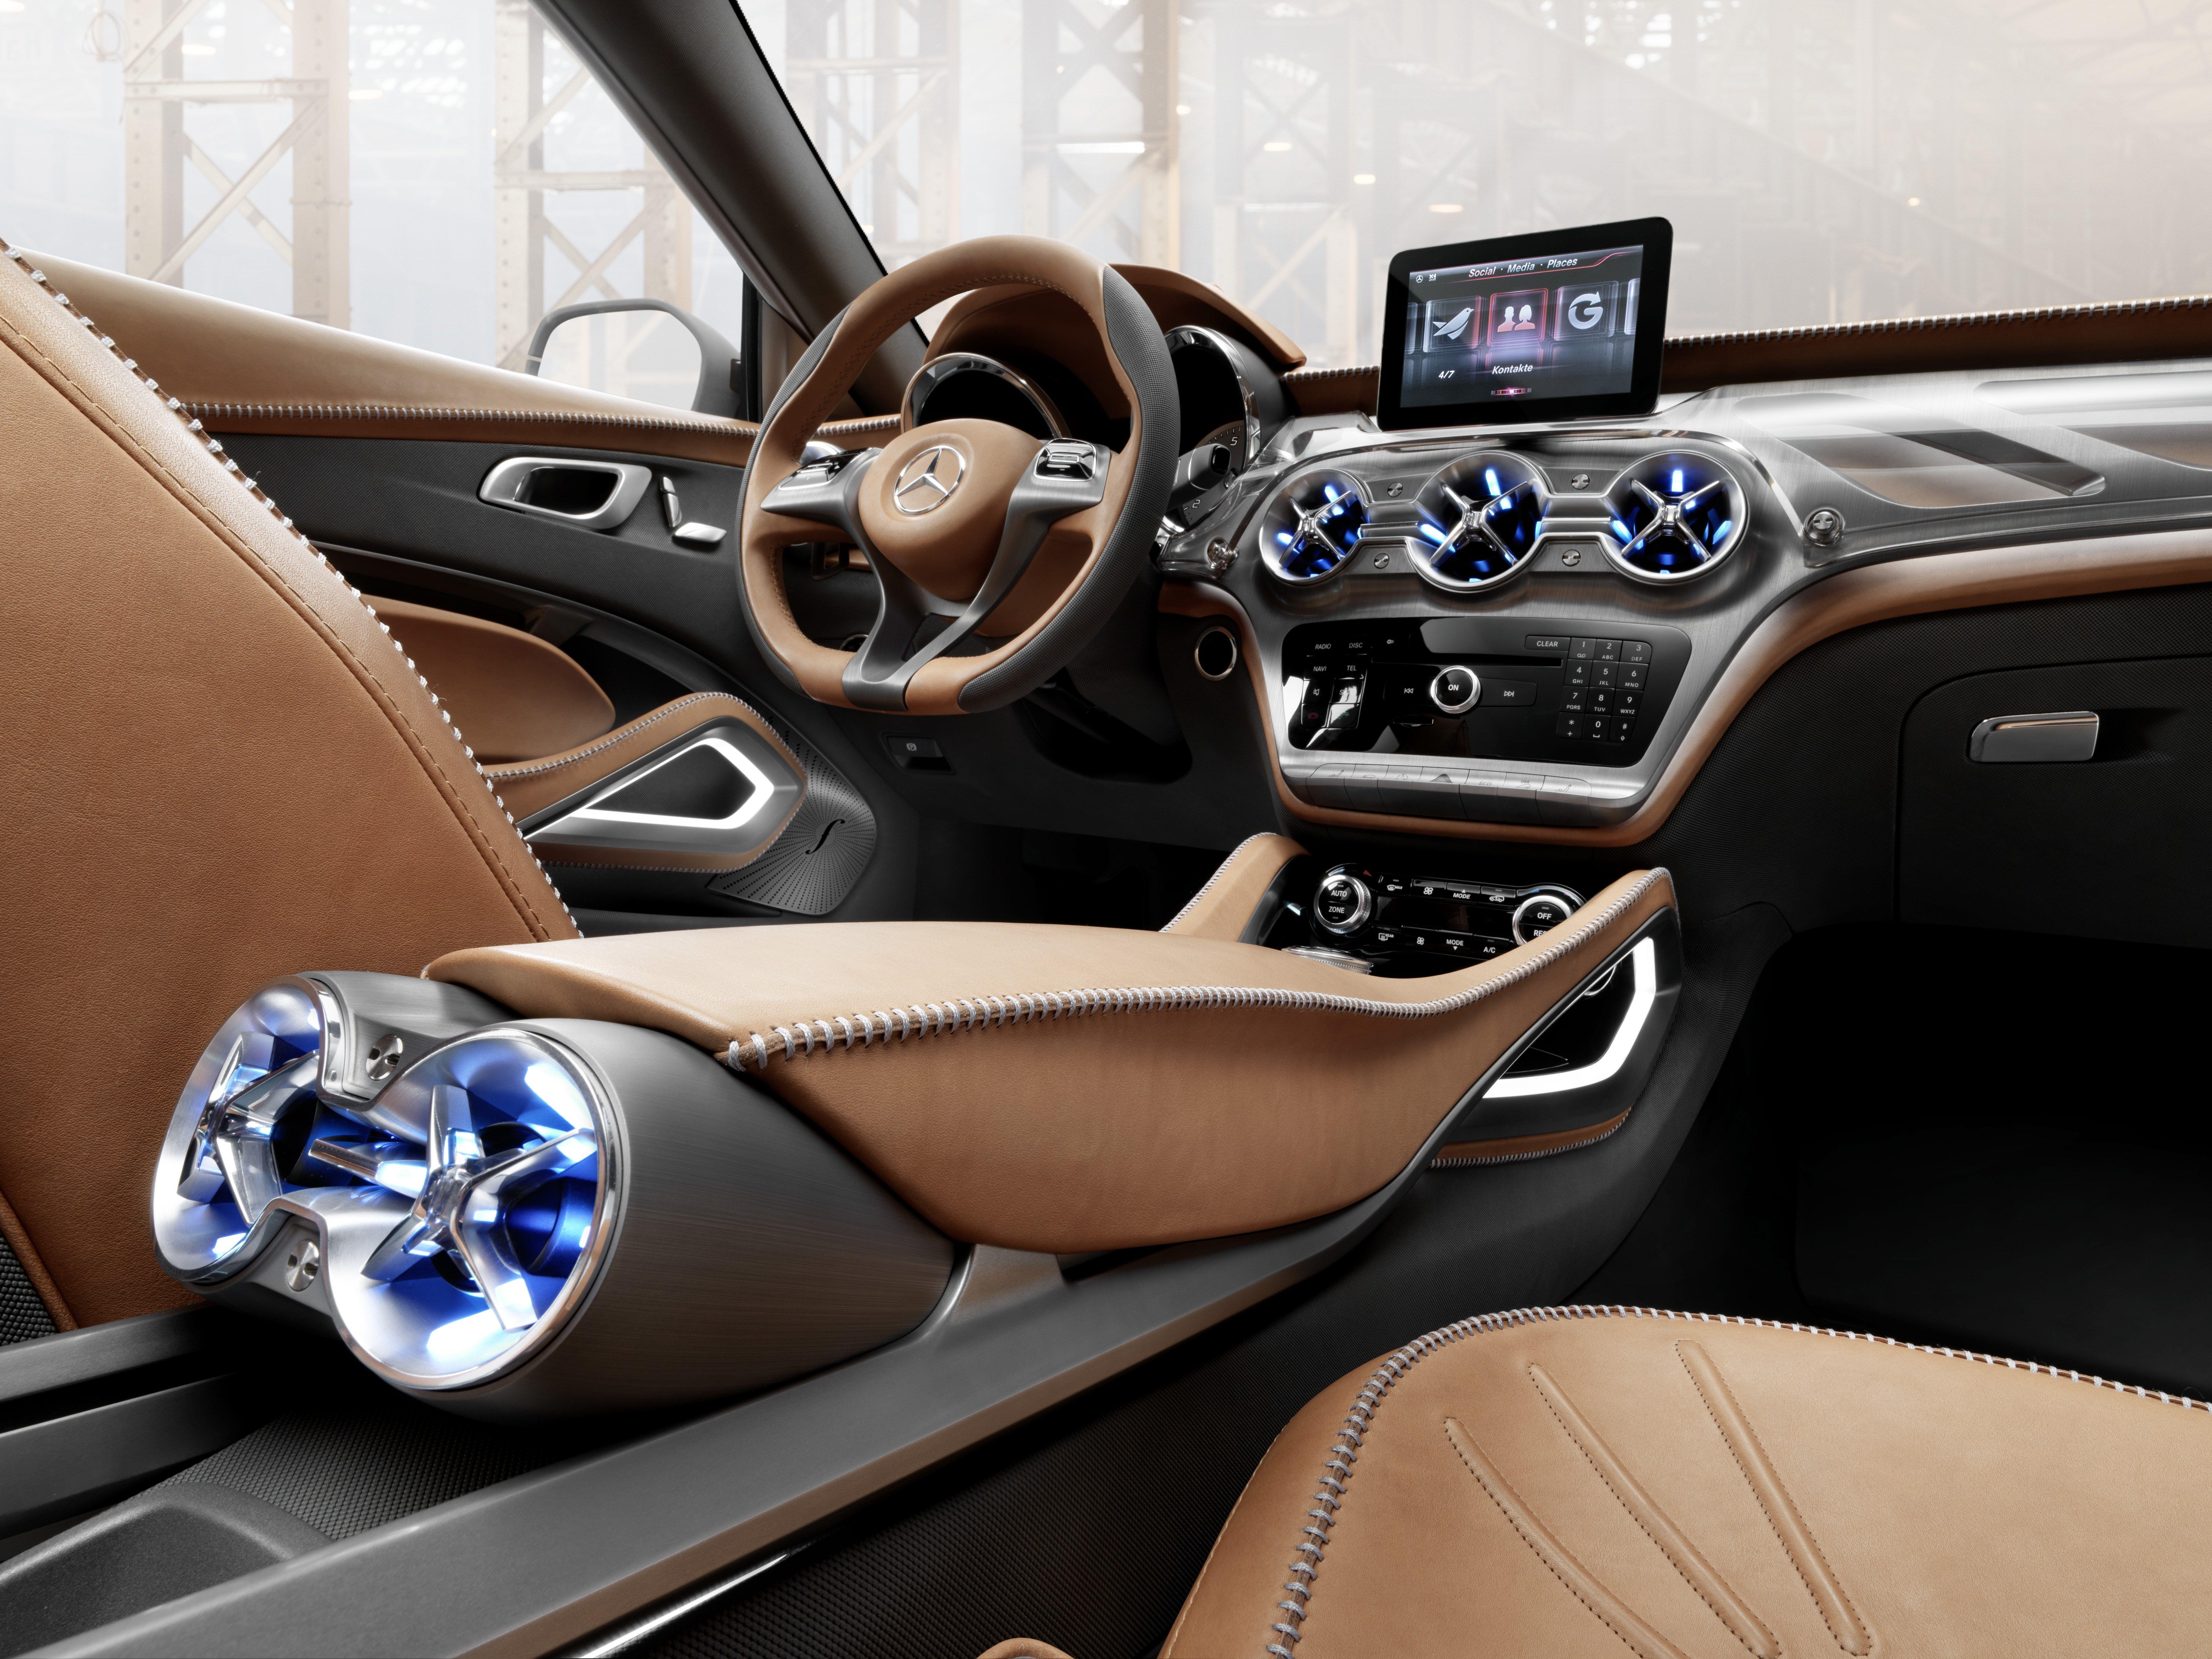 Mercedes Benz Gla Class Widescreen Retina Imac 7304x5478 With